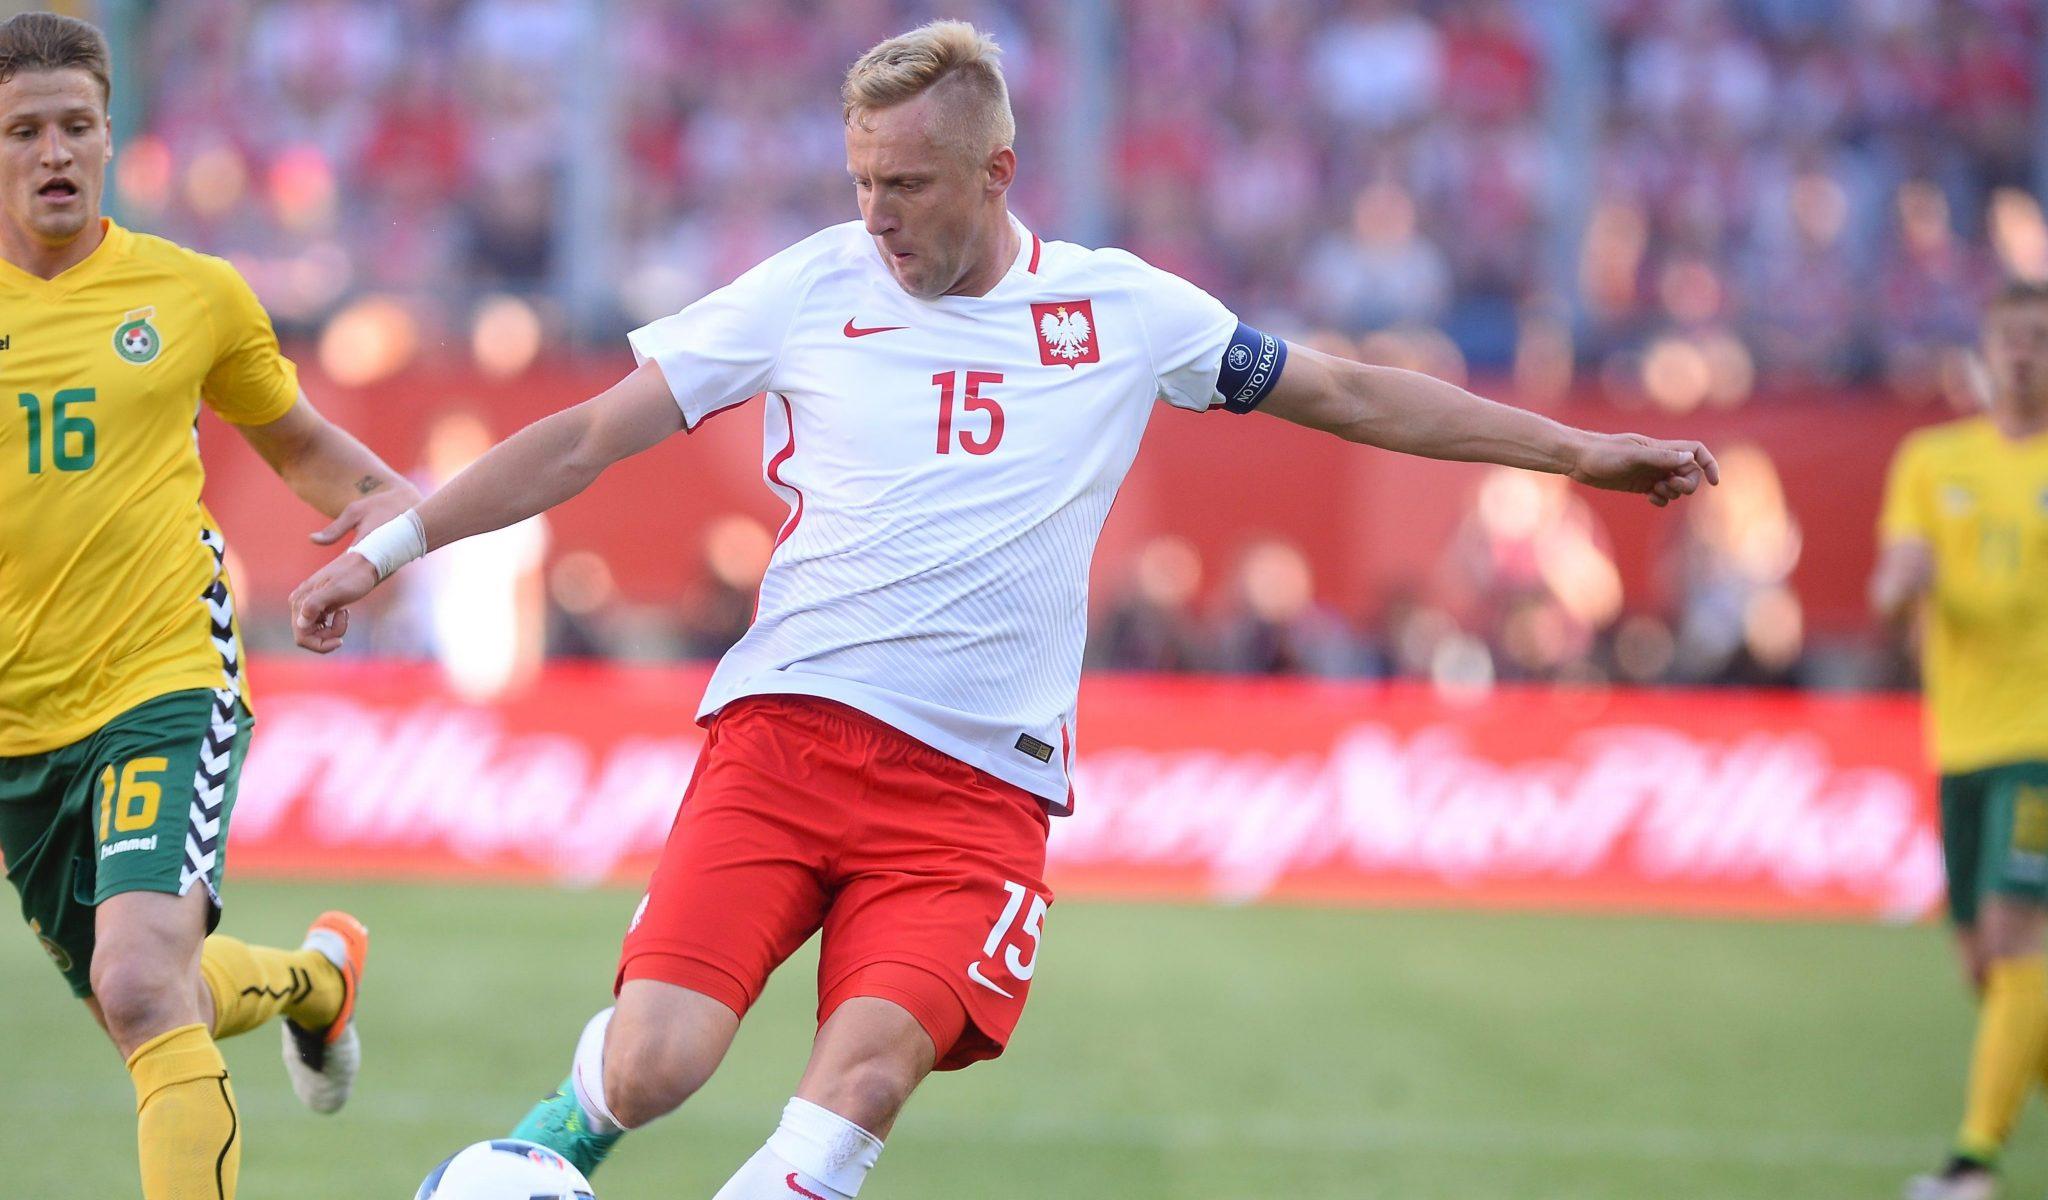 Kamil Glik, mecz Polska - Litwa